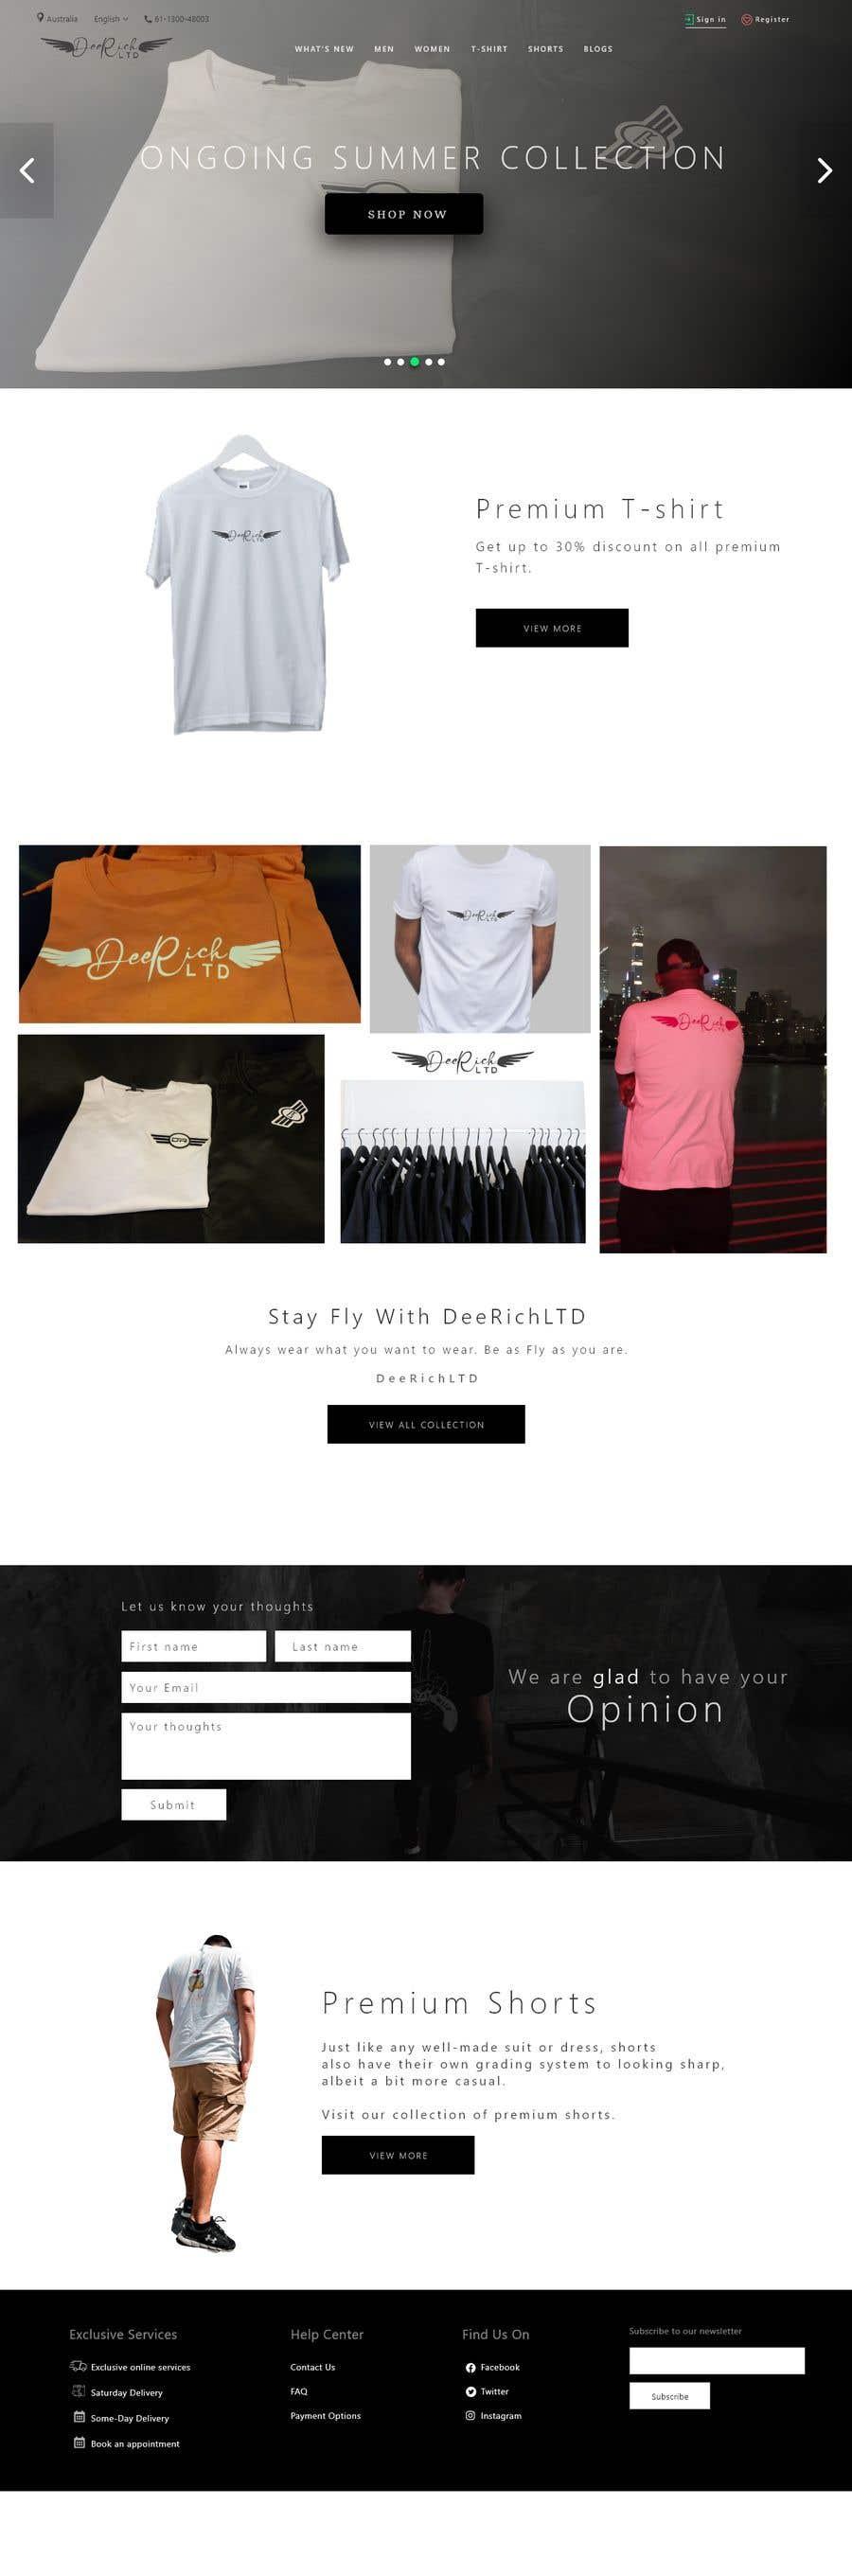 Konkurrenceindlæg #                                        54                                      for                                         build me a website for my clothing brand